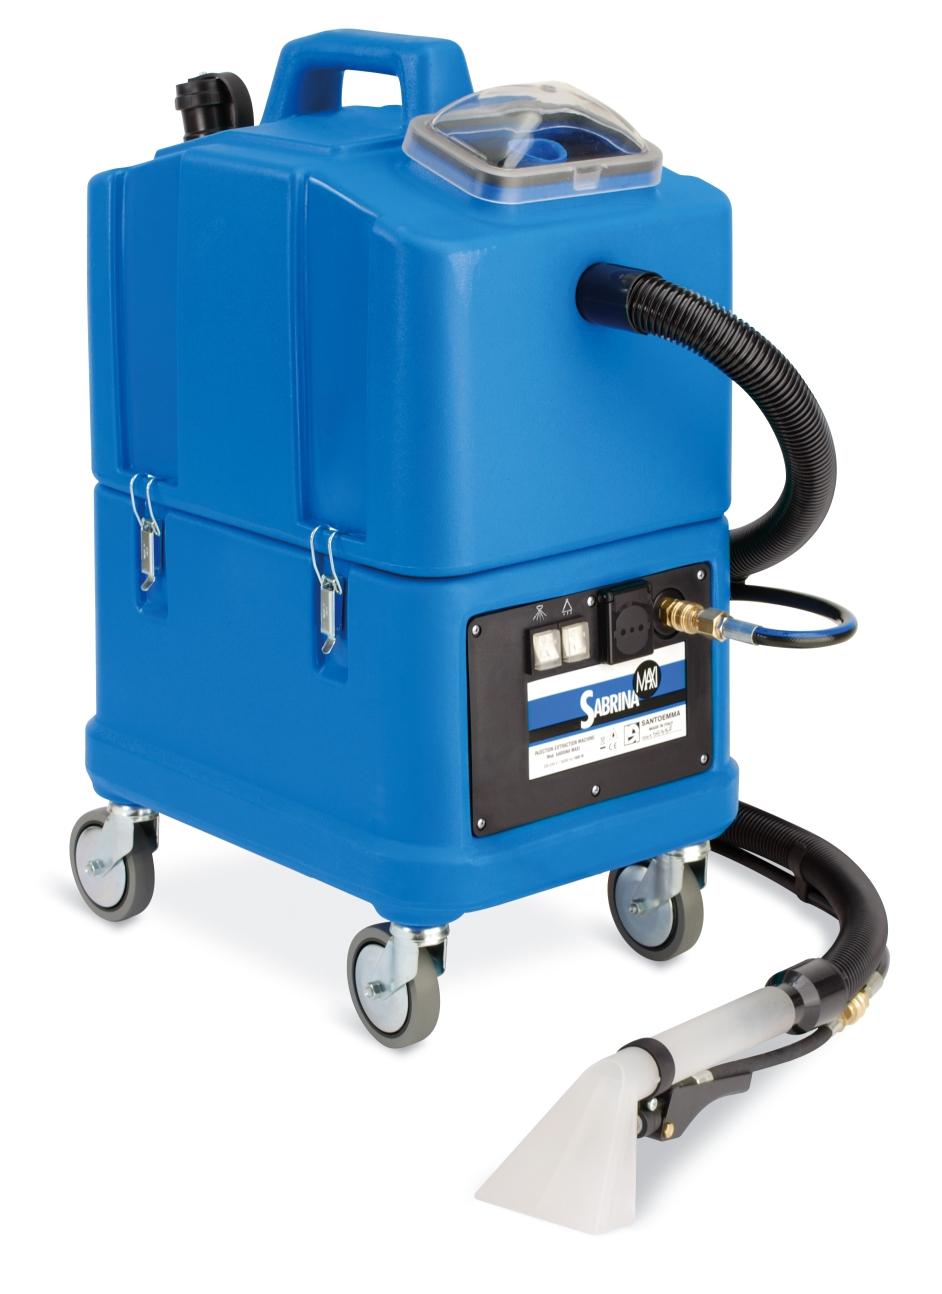 Car Wash Vacuum >> SW30 - Iniezione-Estrazione - CAR Wash